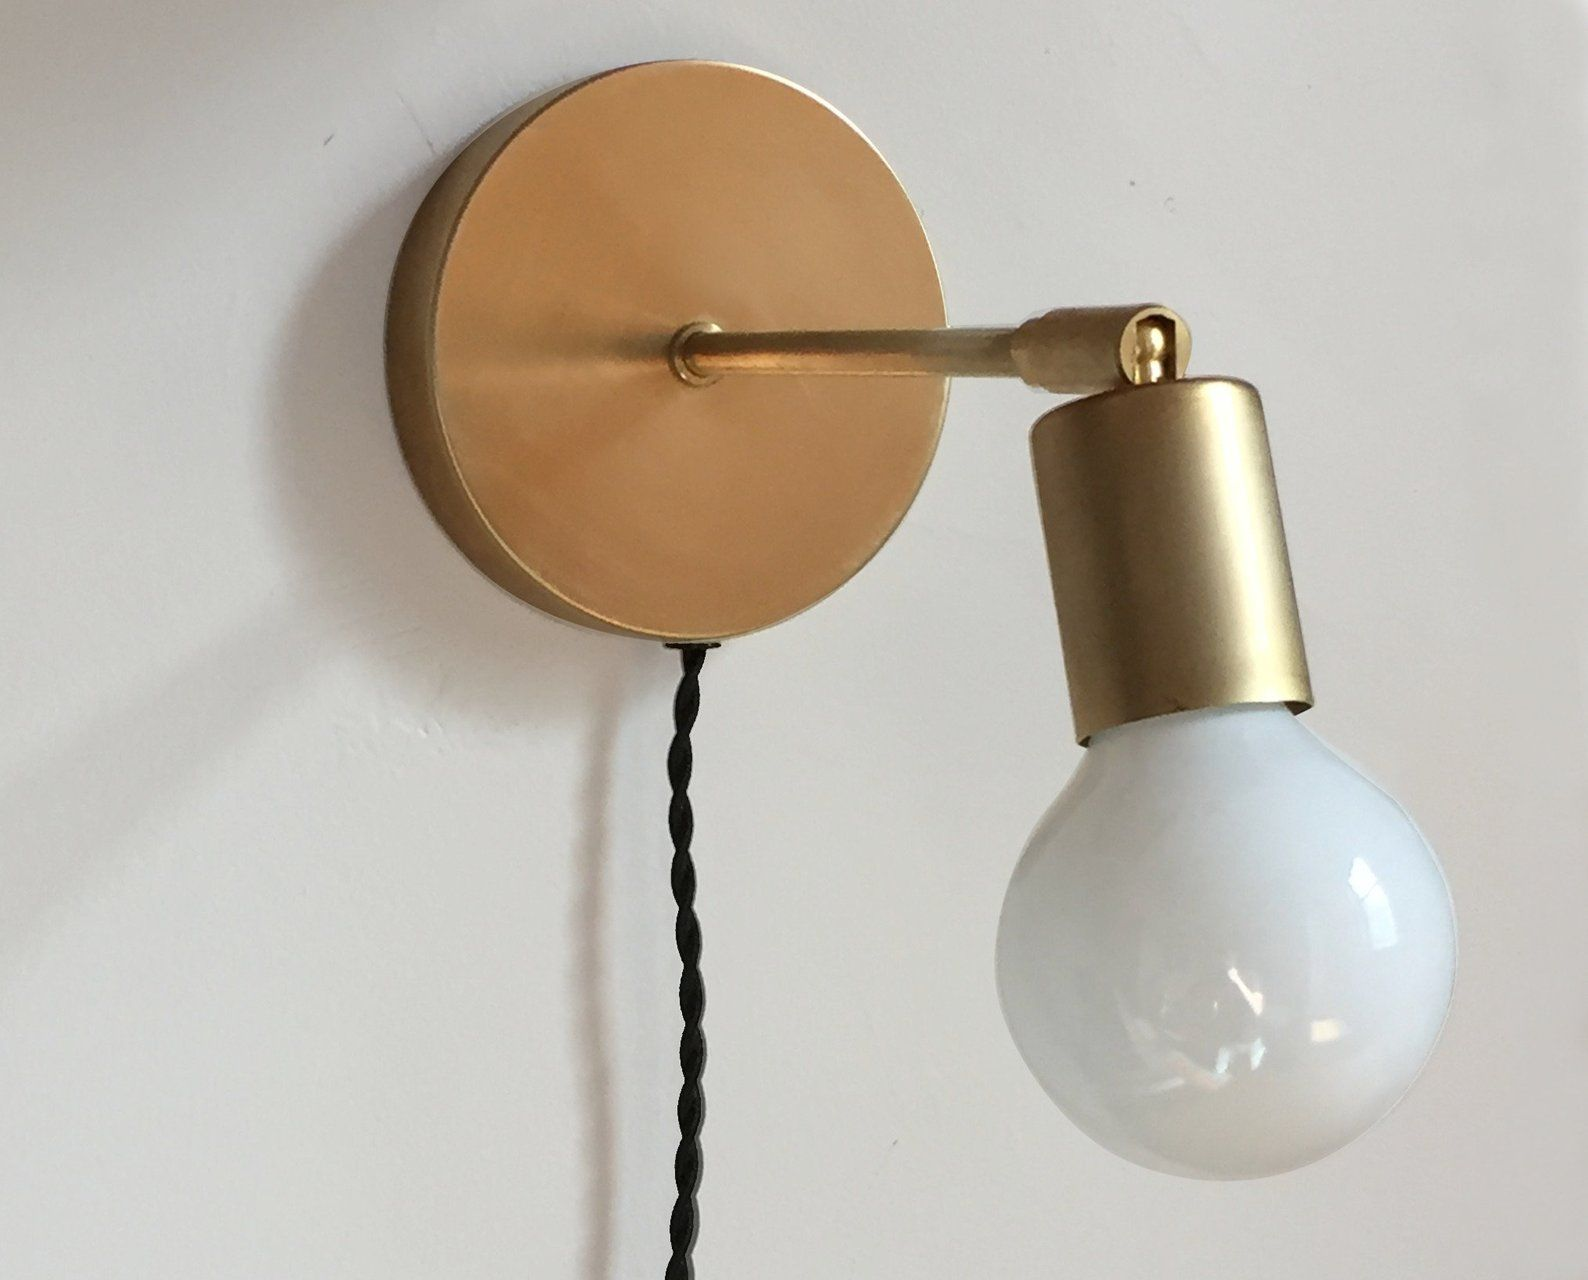 Plug In Wall Sconce Alice Modern Adjustable Minimalist Etsy Plug In Wall Sconce Wall Lights Modern Brass Lighting